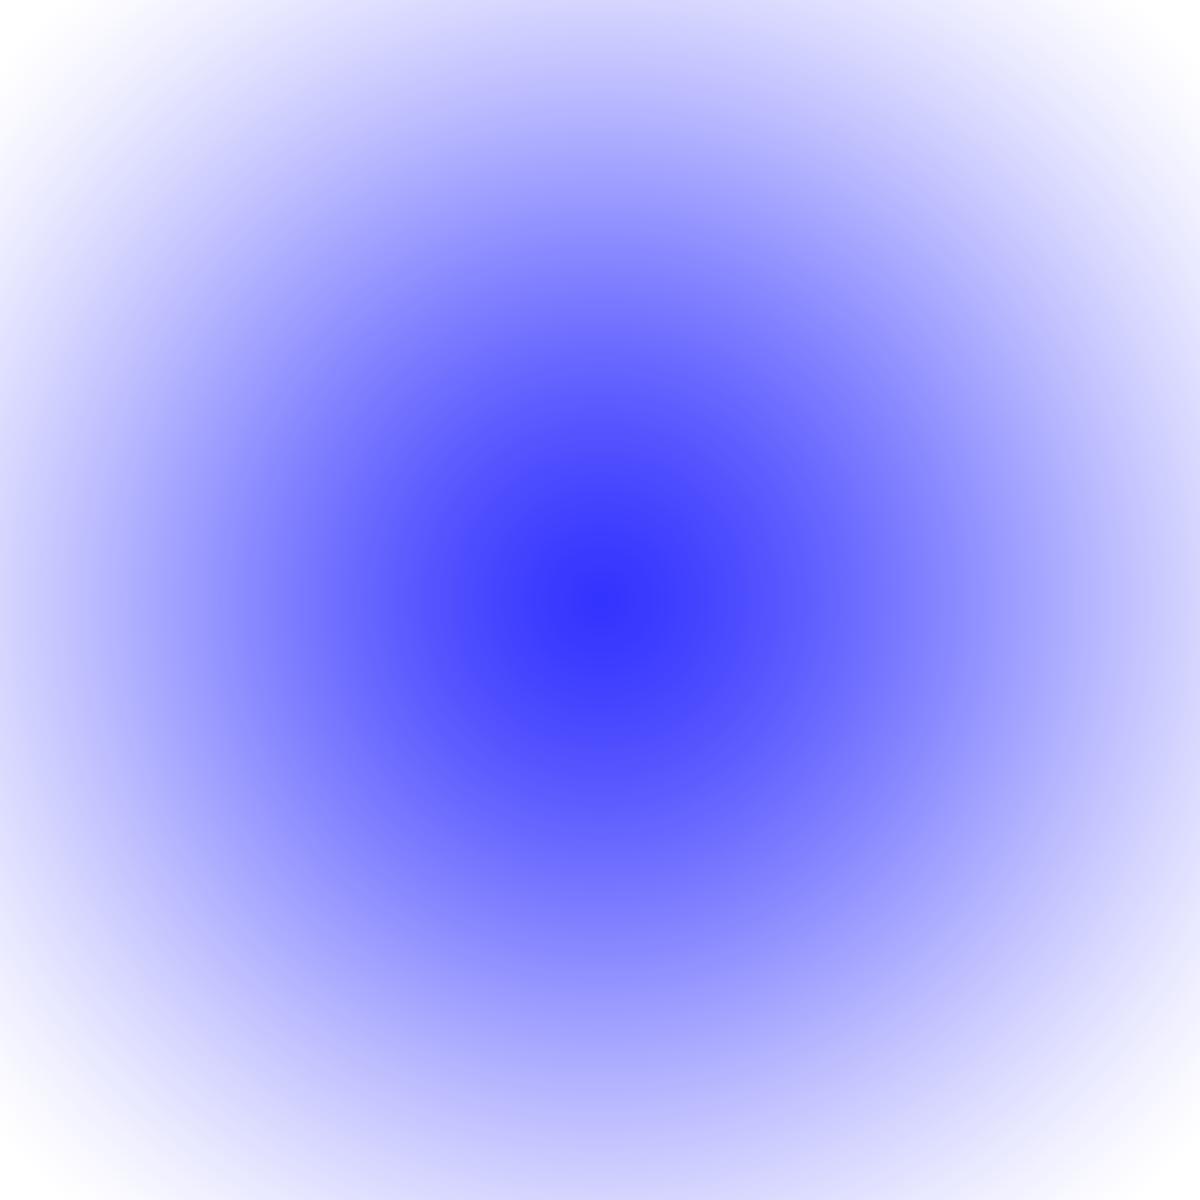 Radial Gradient newi.png